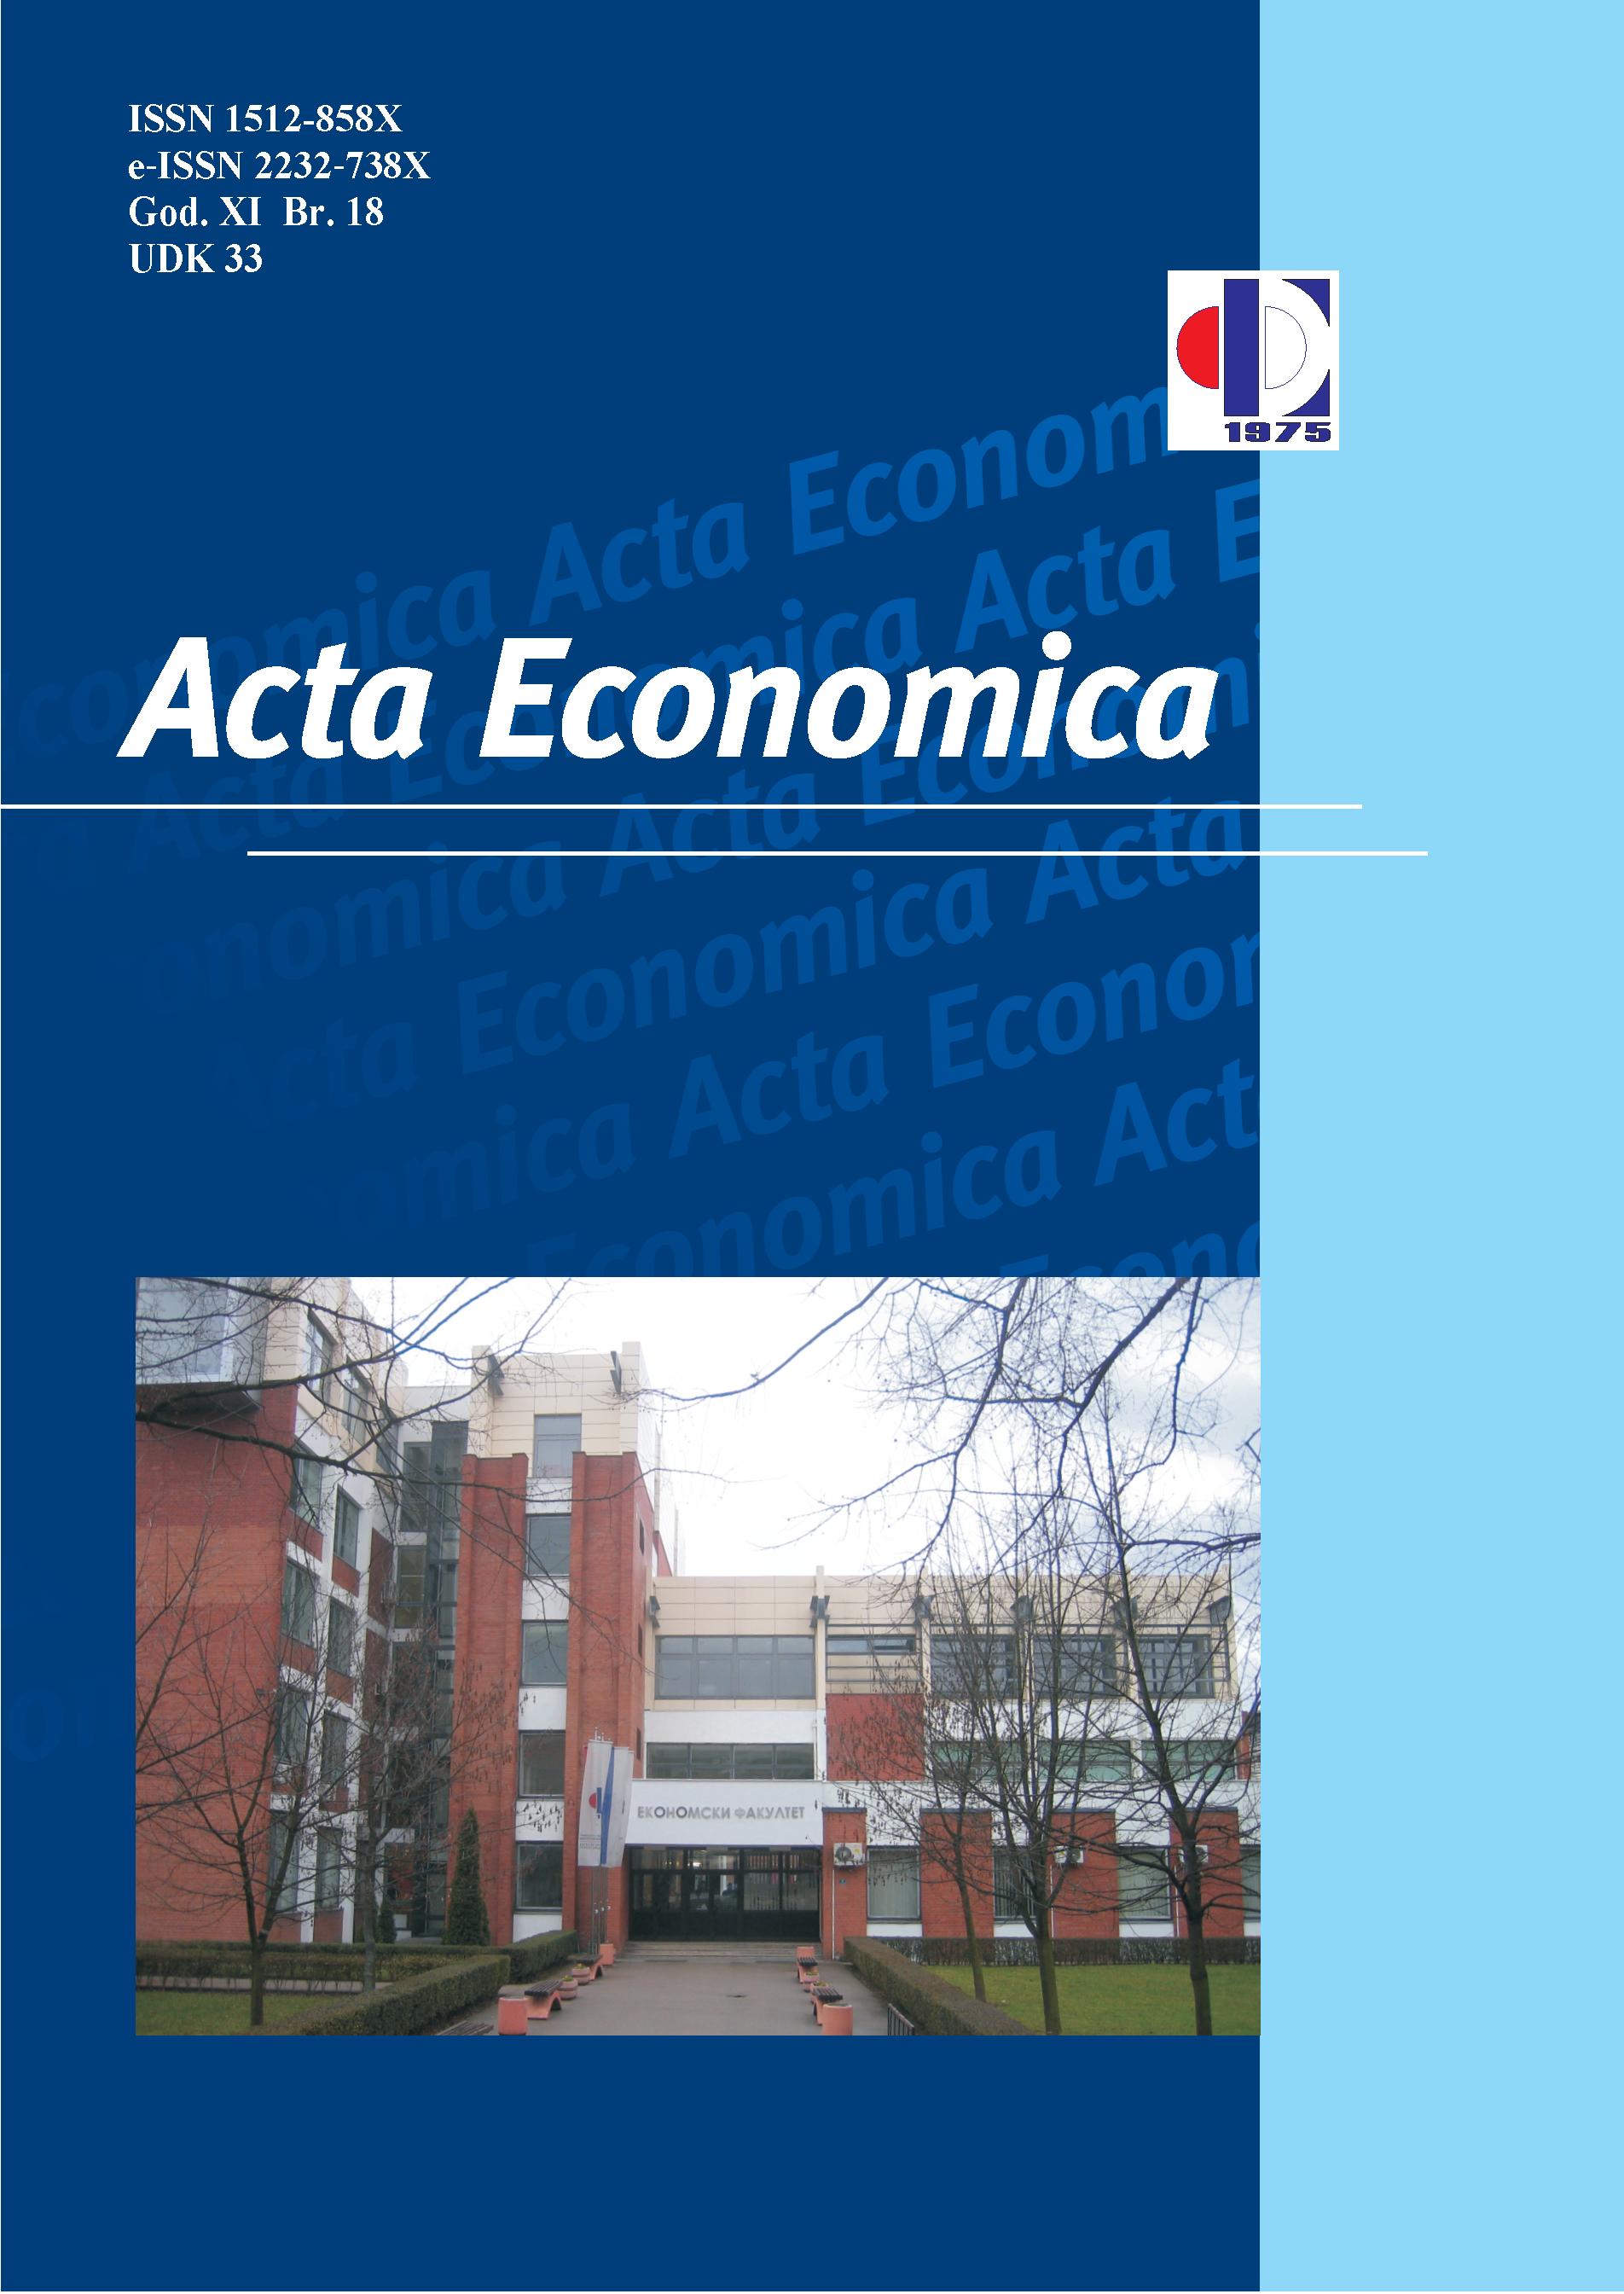 Acta Economica